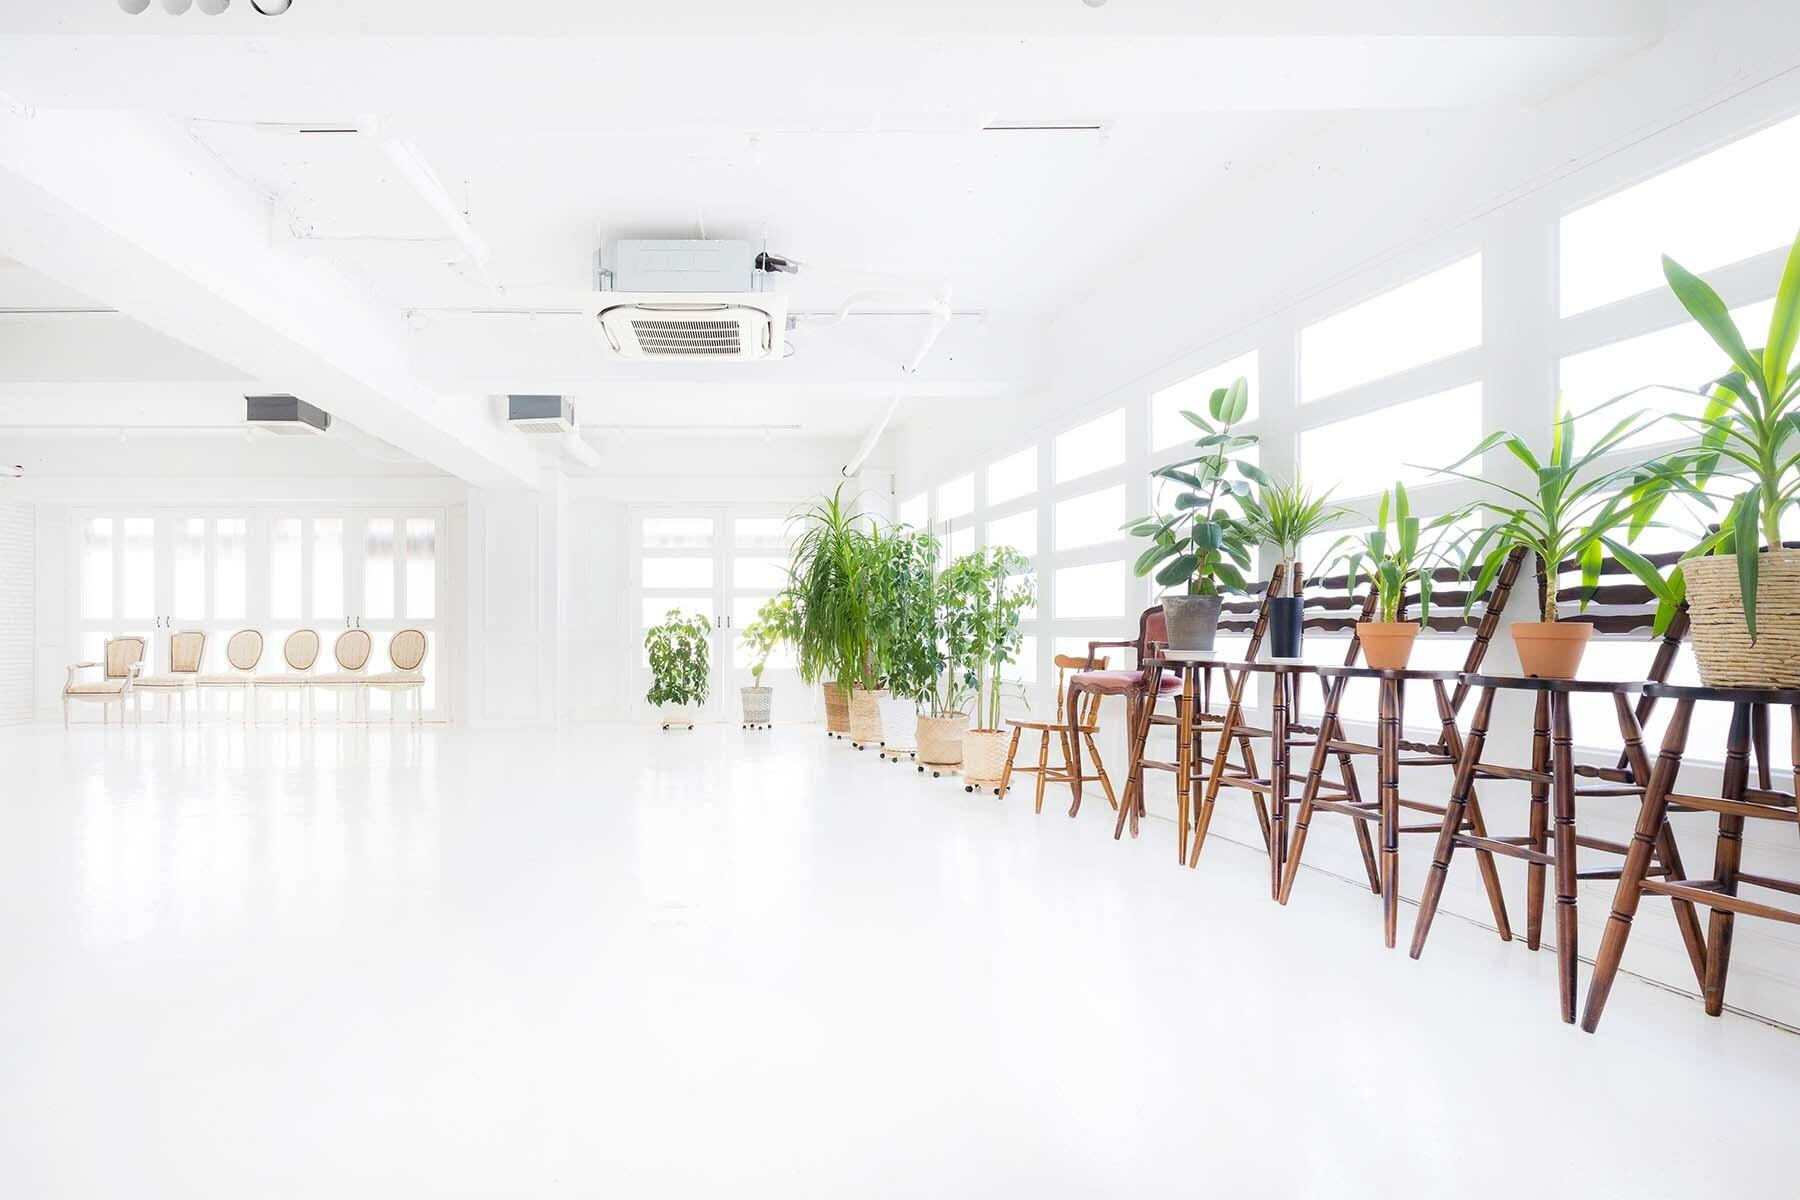 Studio Serato 笹塚 (スタジオセラート笹塚)全幅約9mの窓